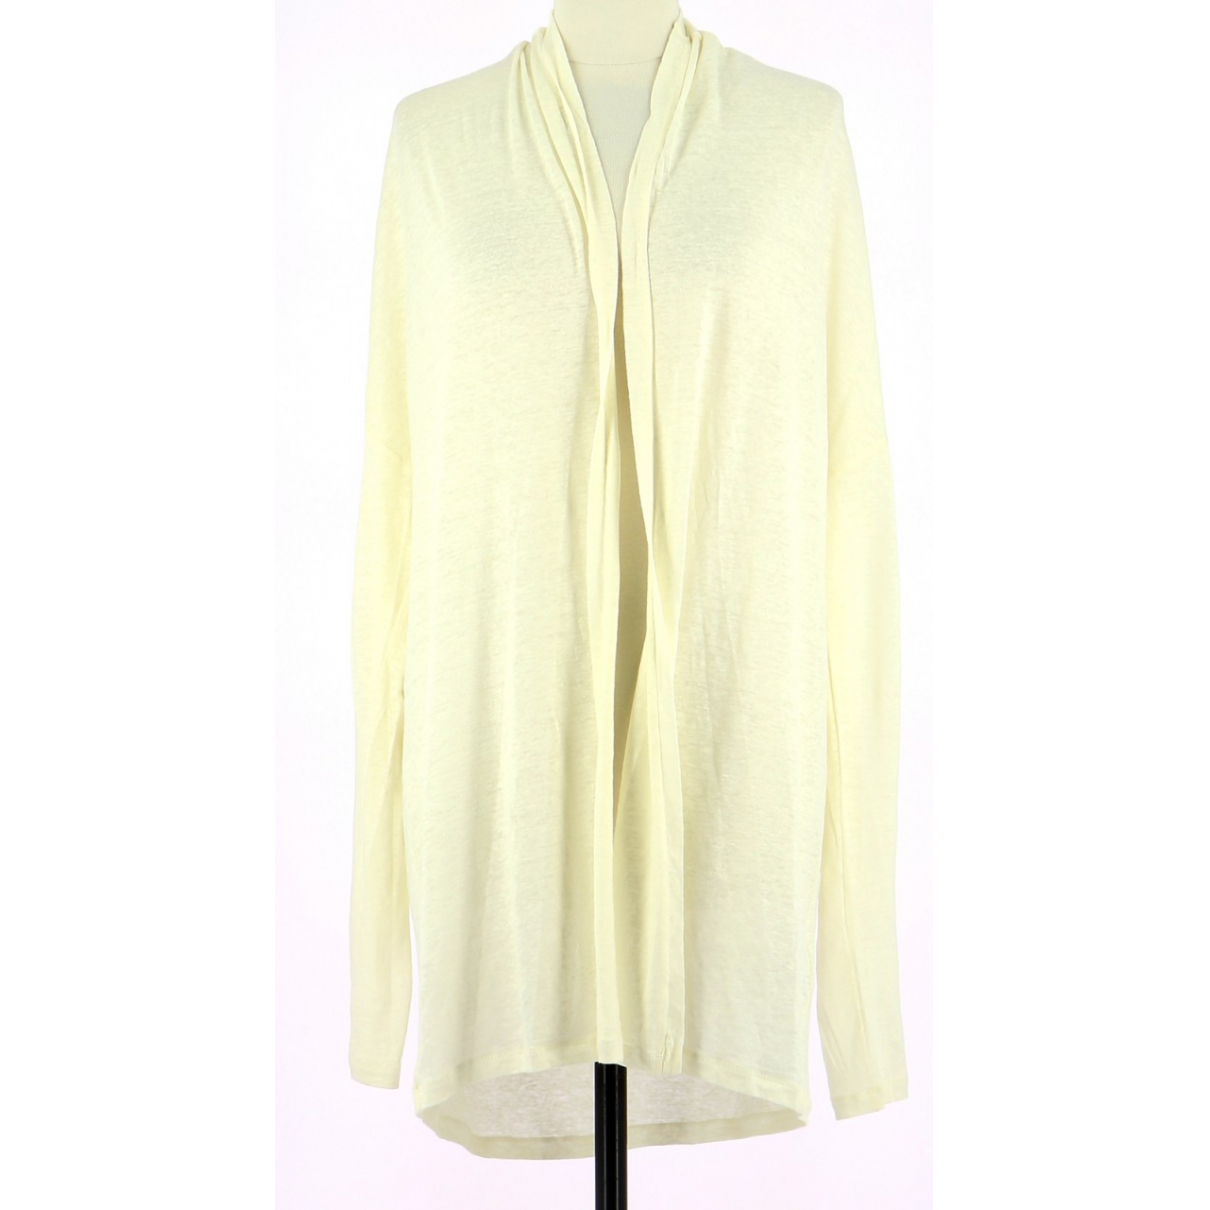 Autre Marque \N White Linen Knitwear & Sweatshirts for Men 42 FR